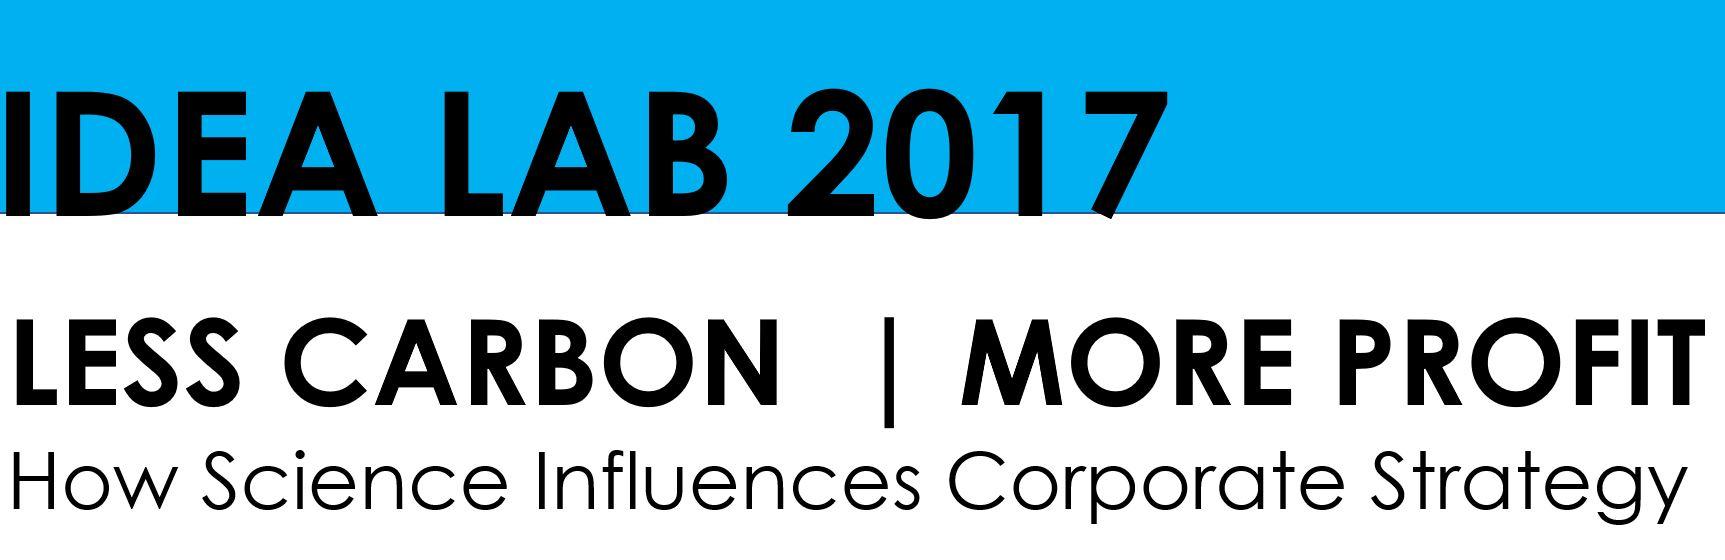 IDEA LAB 2017 Less Carbon, More Profit: How Science Influences Corporate Strategy